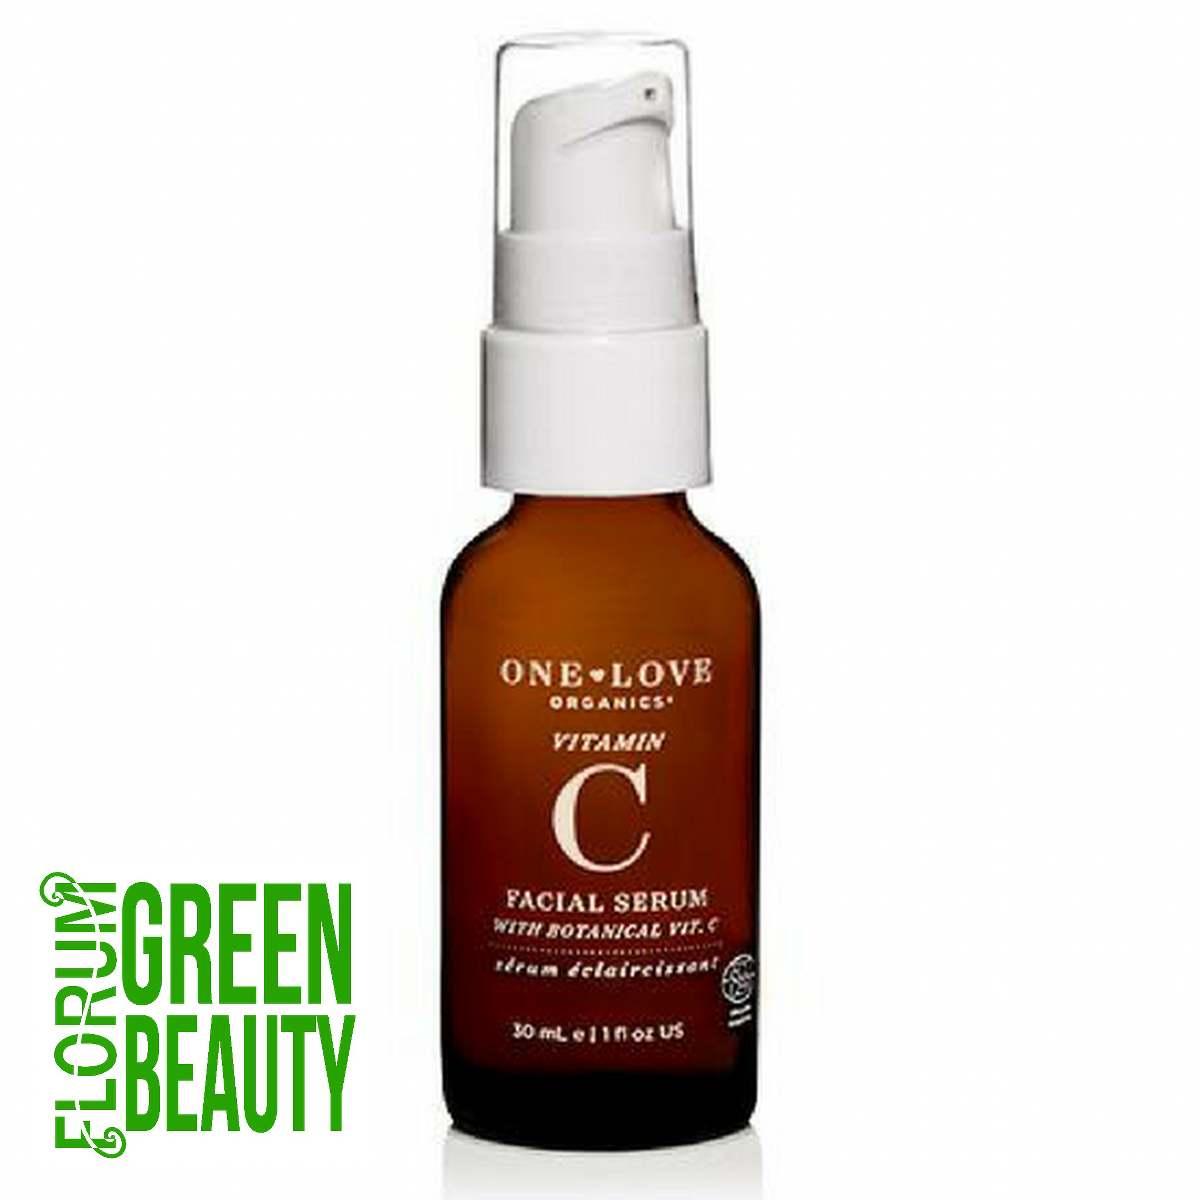 One Love Organics - Vitamin C Facial Serum